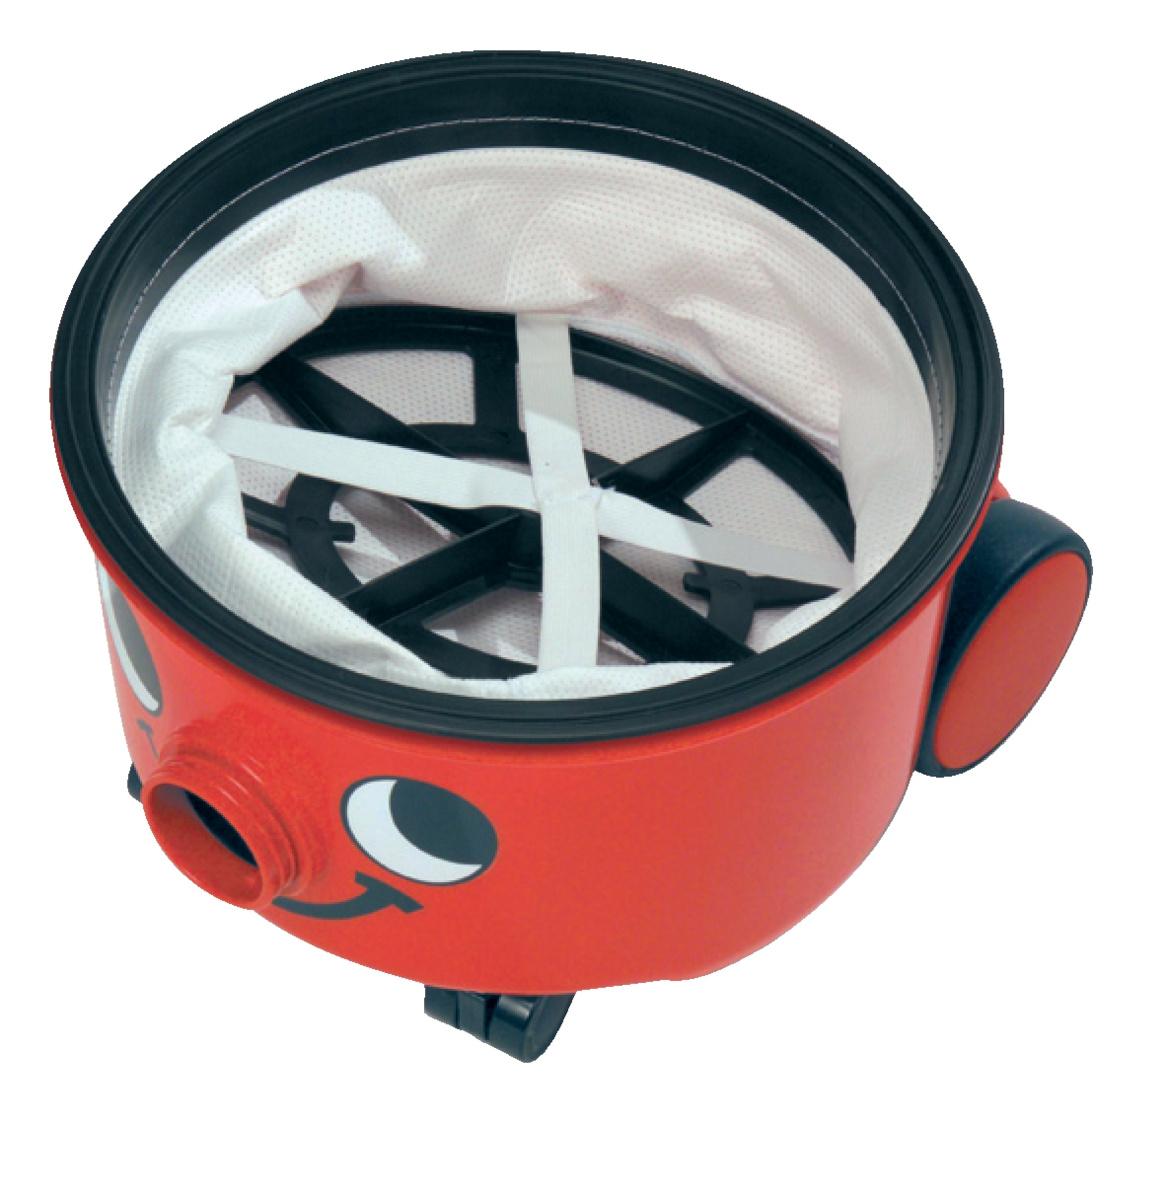 Sac aspirateur Numatic (10 pièces)